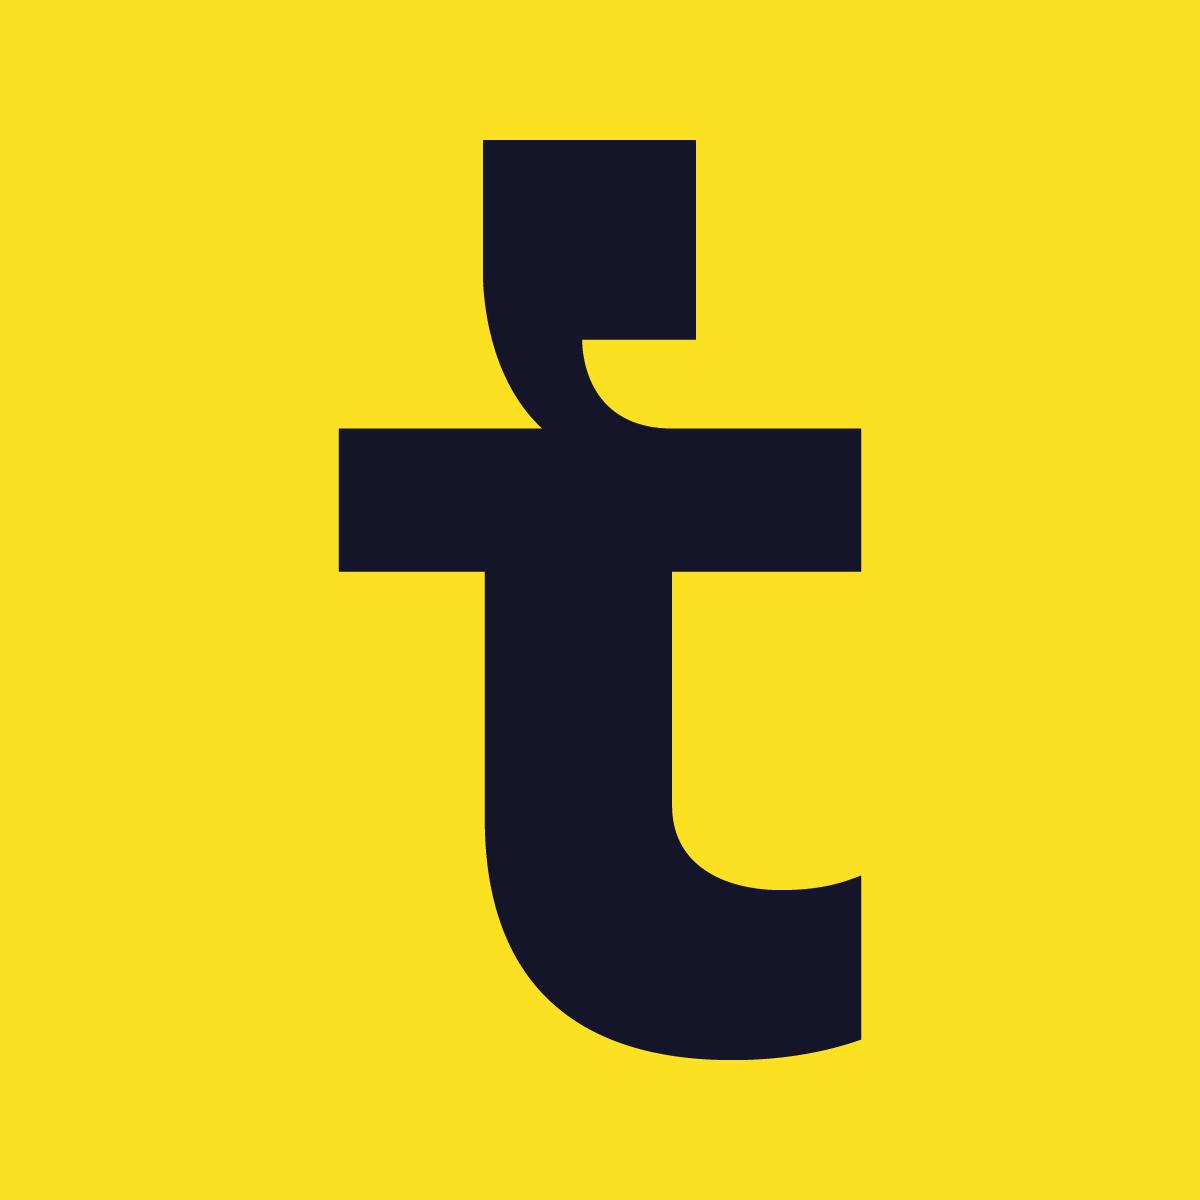 Trint_Icon_Yellow_BG